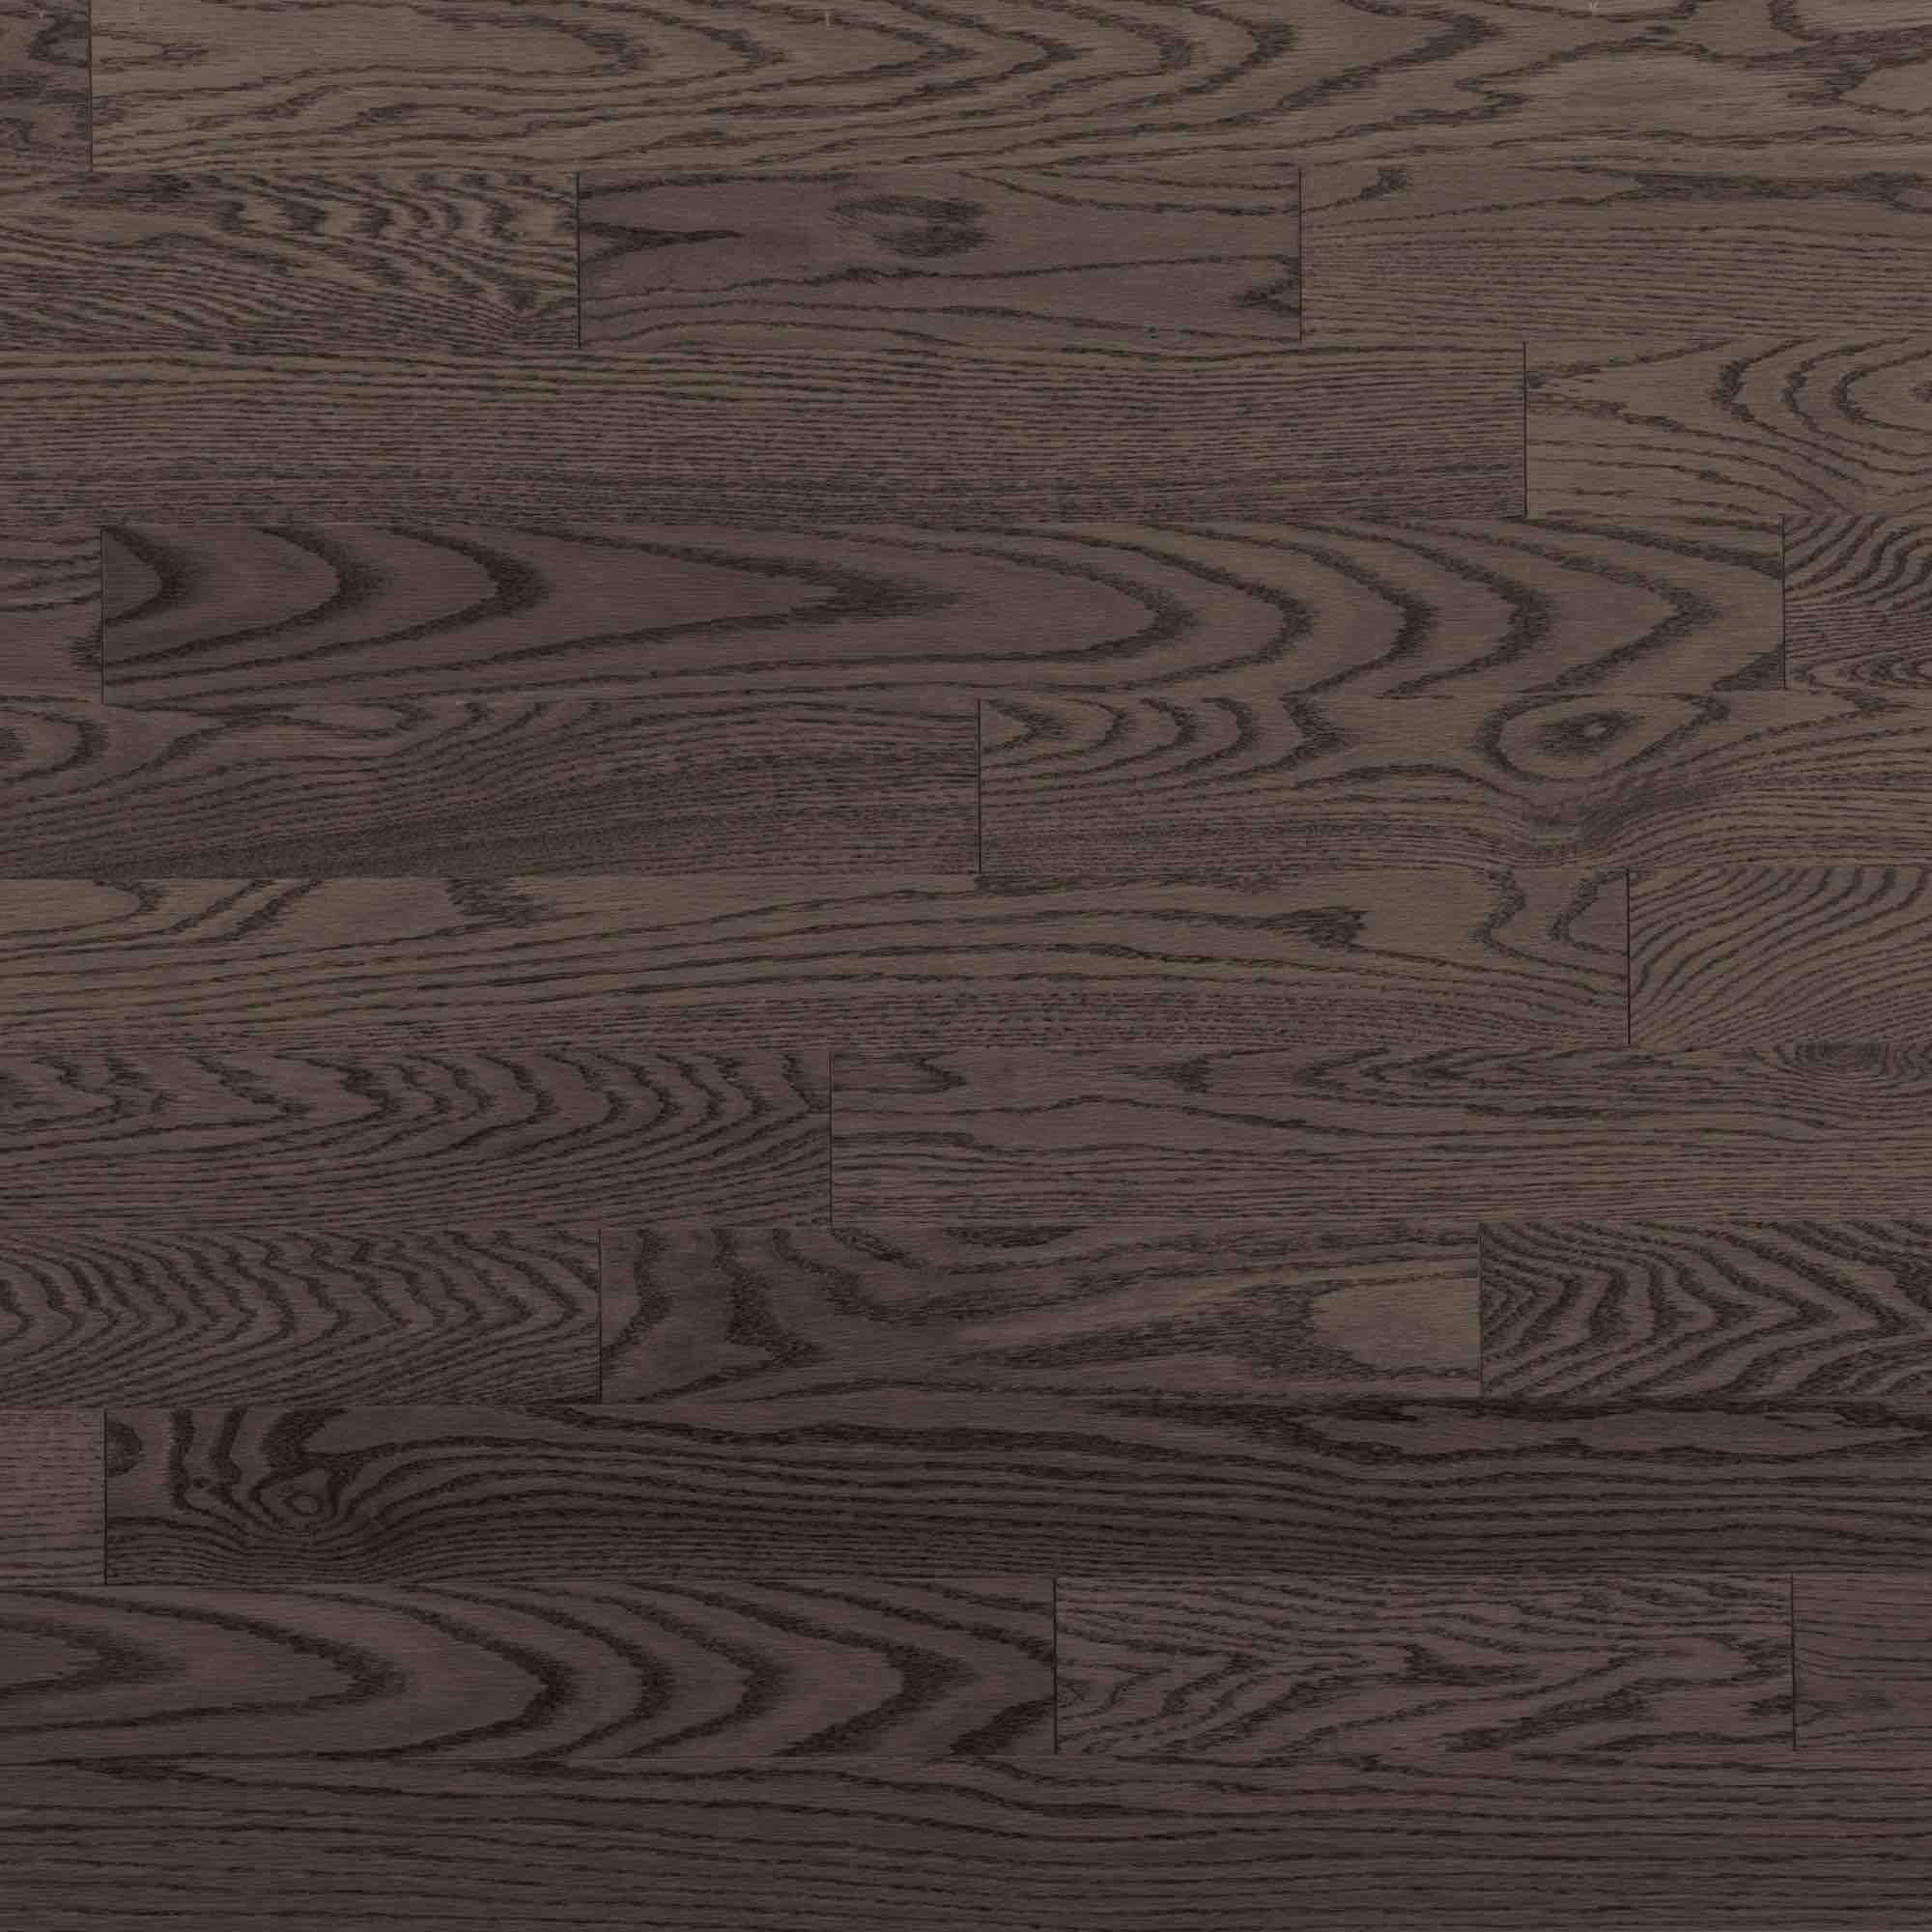 Best Hardwood Flooring Reno Of Hardwood Westfloors West Vancouver Hardwood Flooring Carpet with Featured Hardwoods Red Oak Charcoal